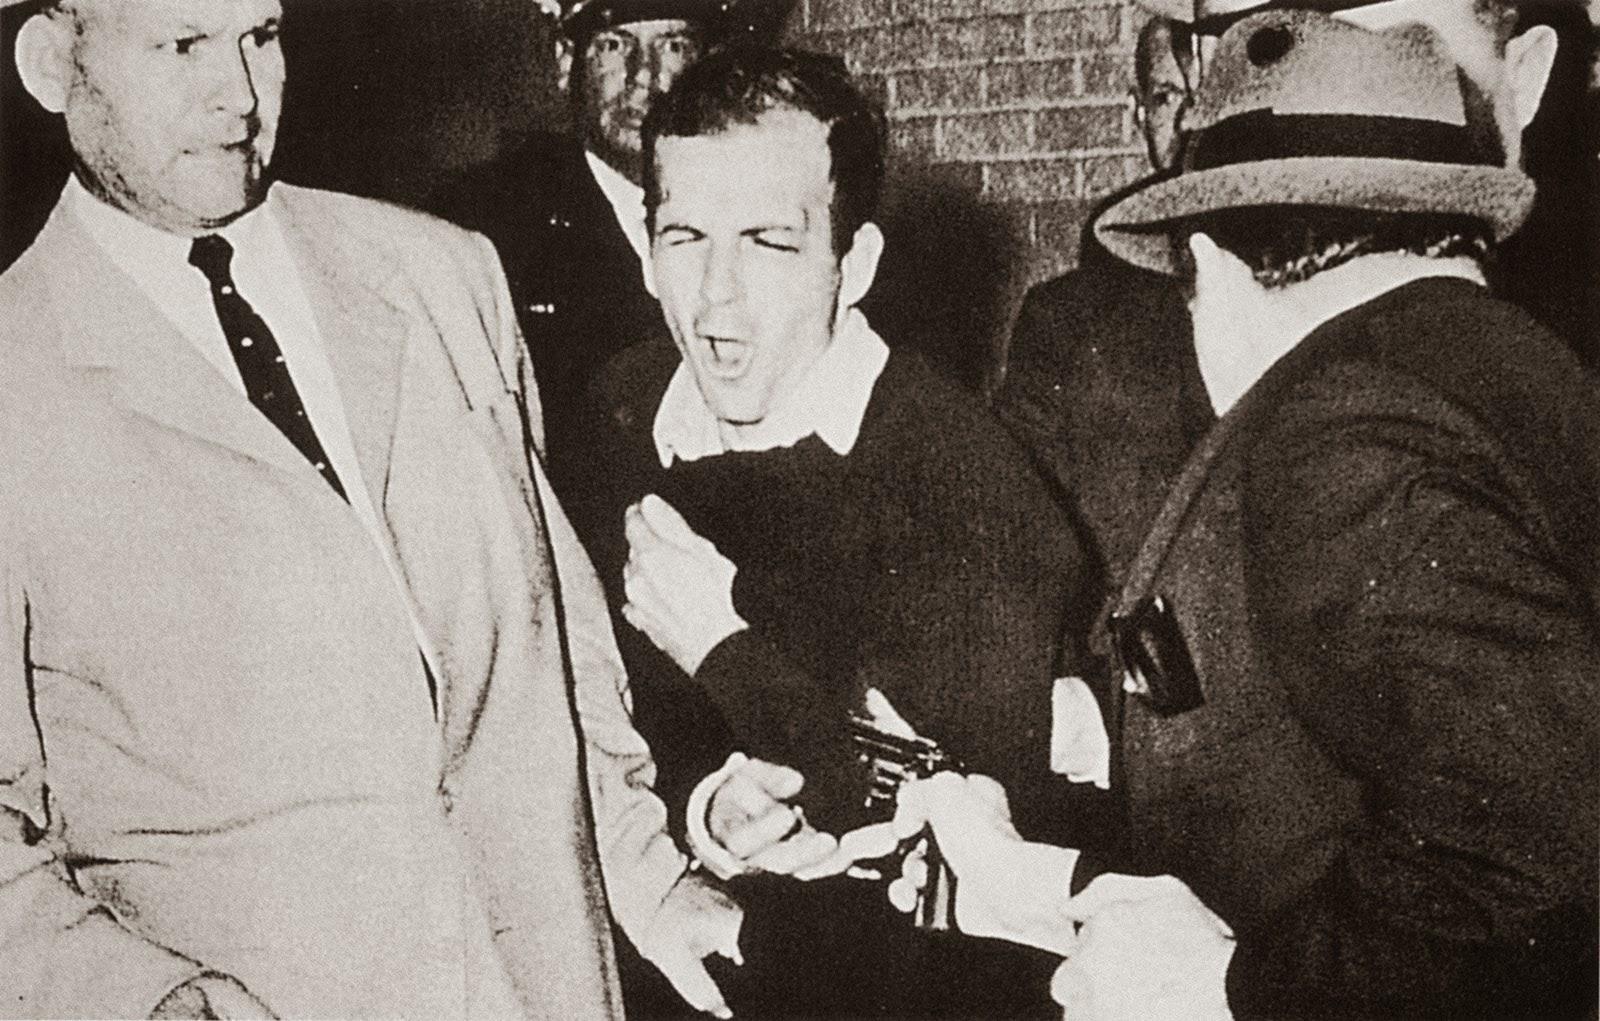 Friday November 1963 22